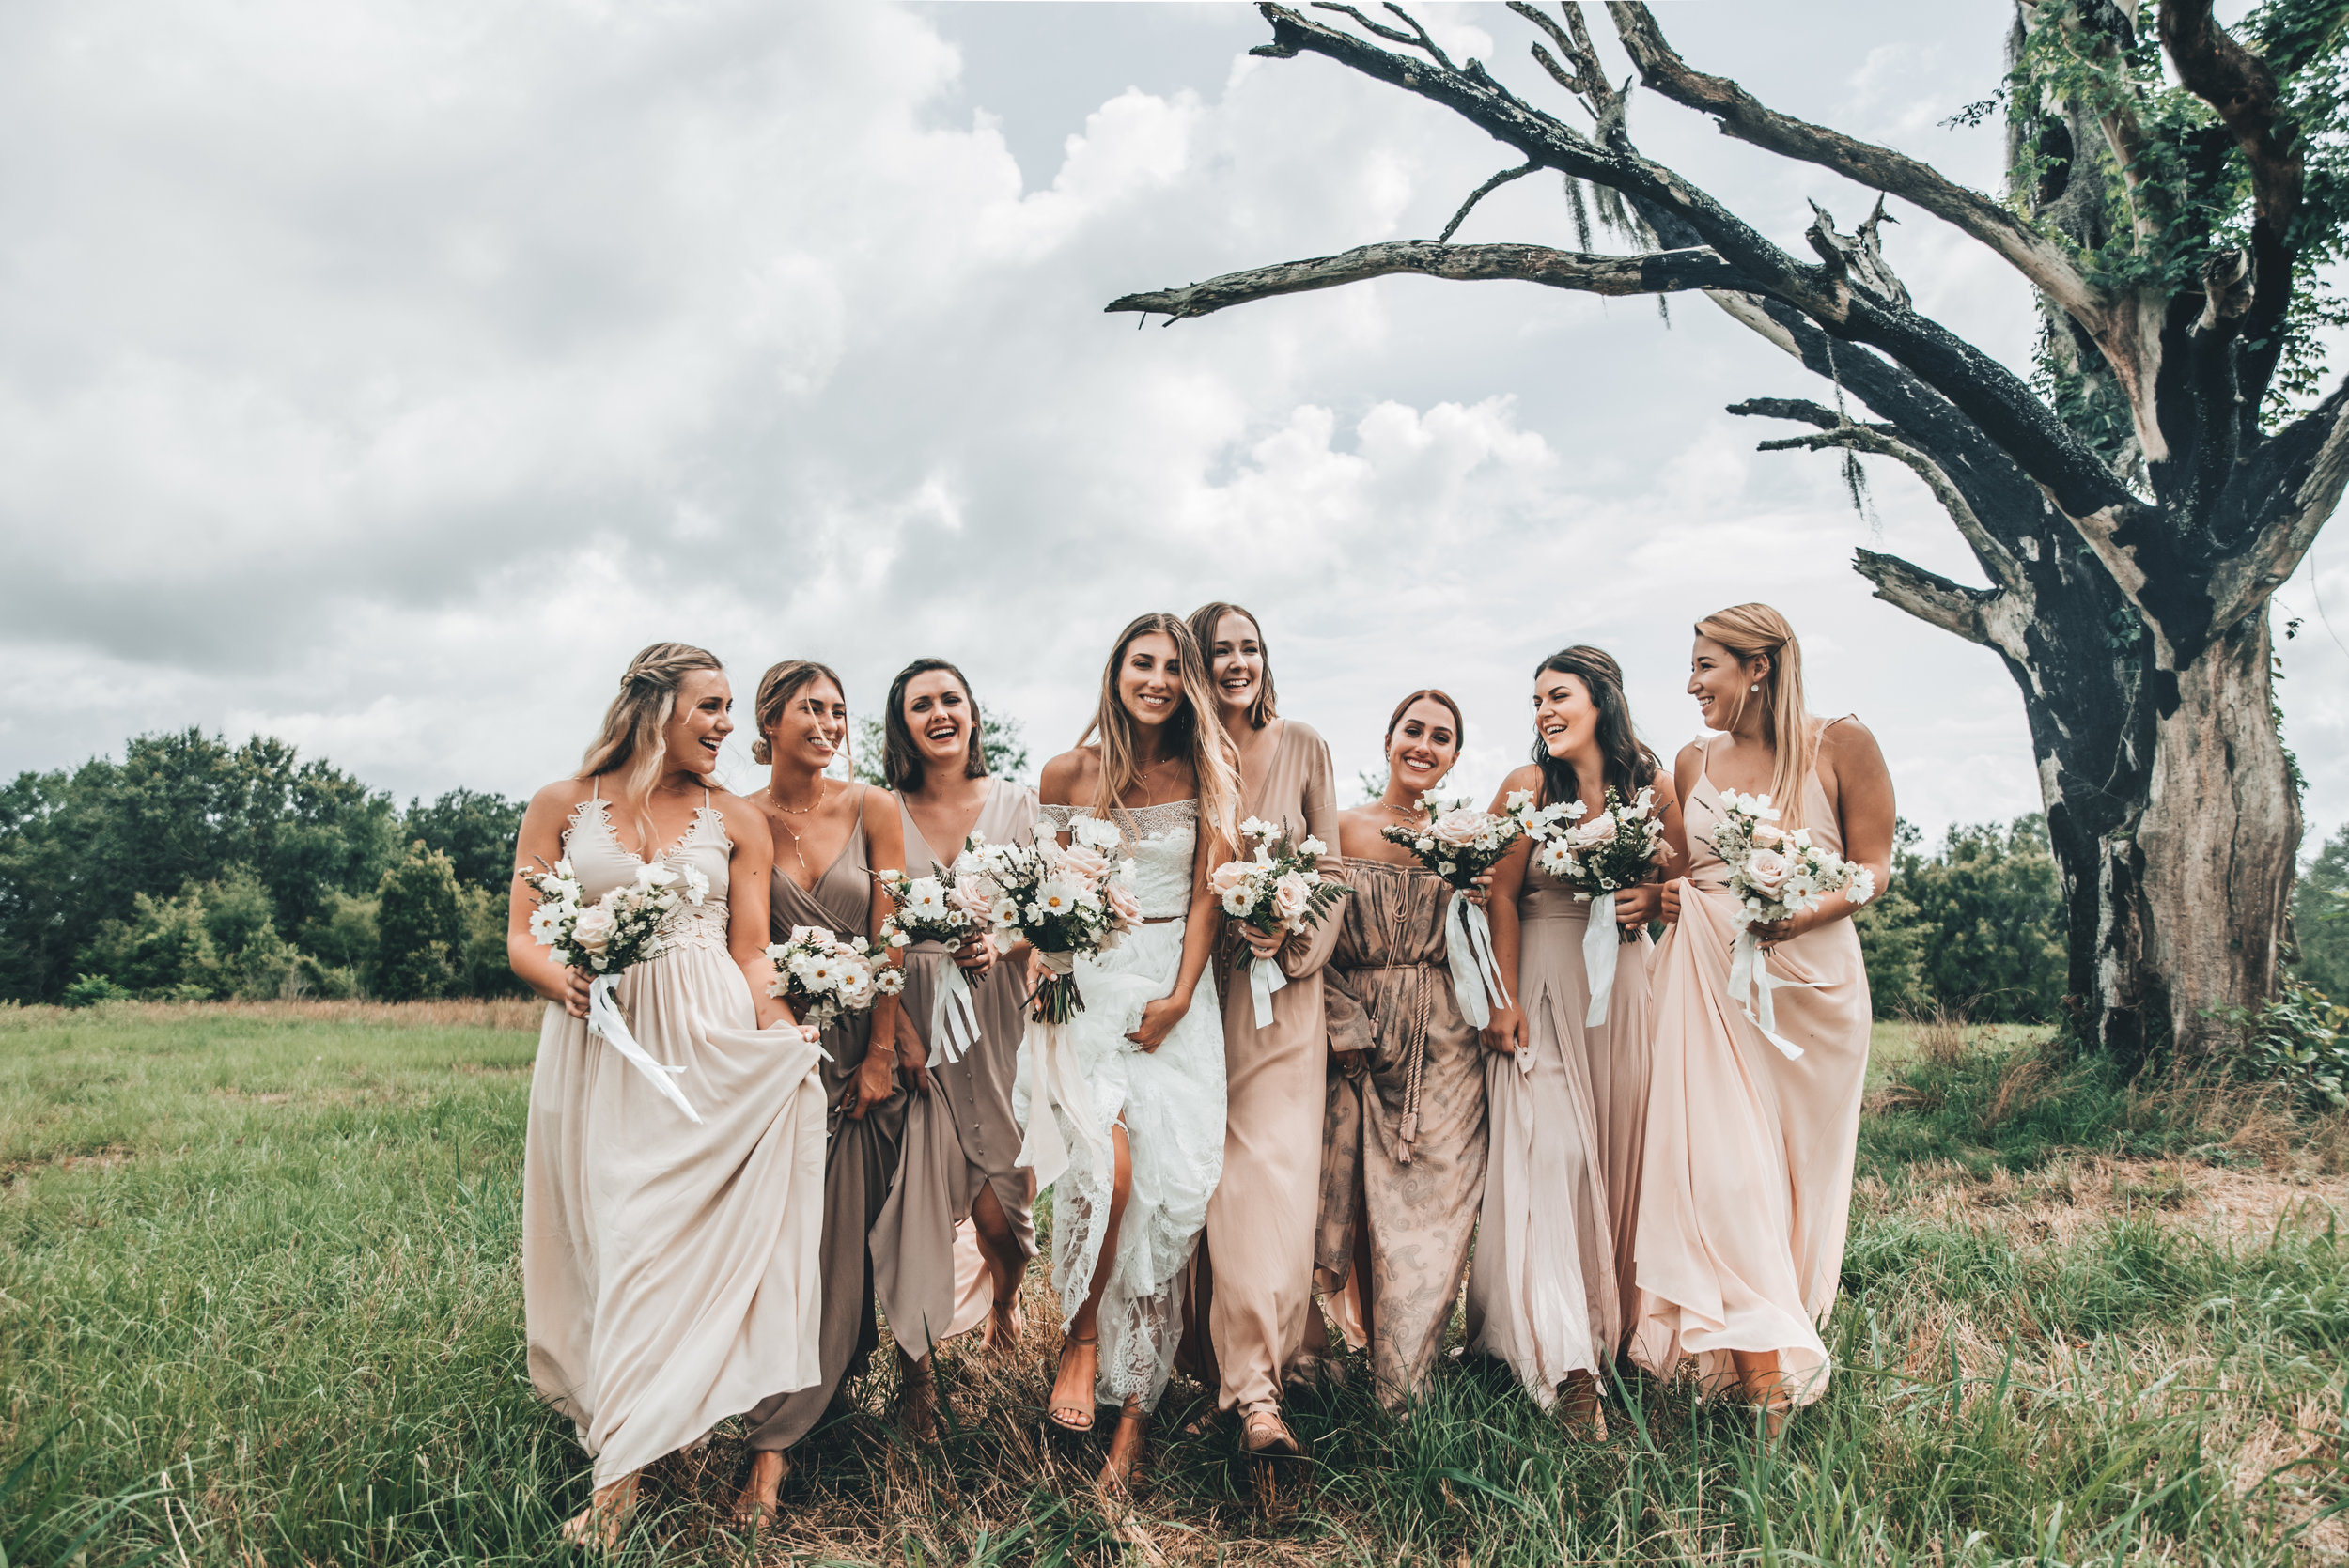 moonstruck_florals_bridesmaids_blush_wedding_tallahassee.jpg